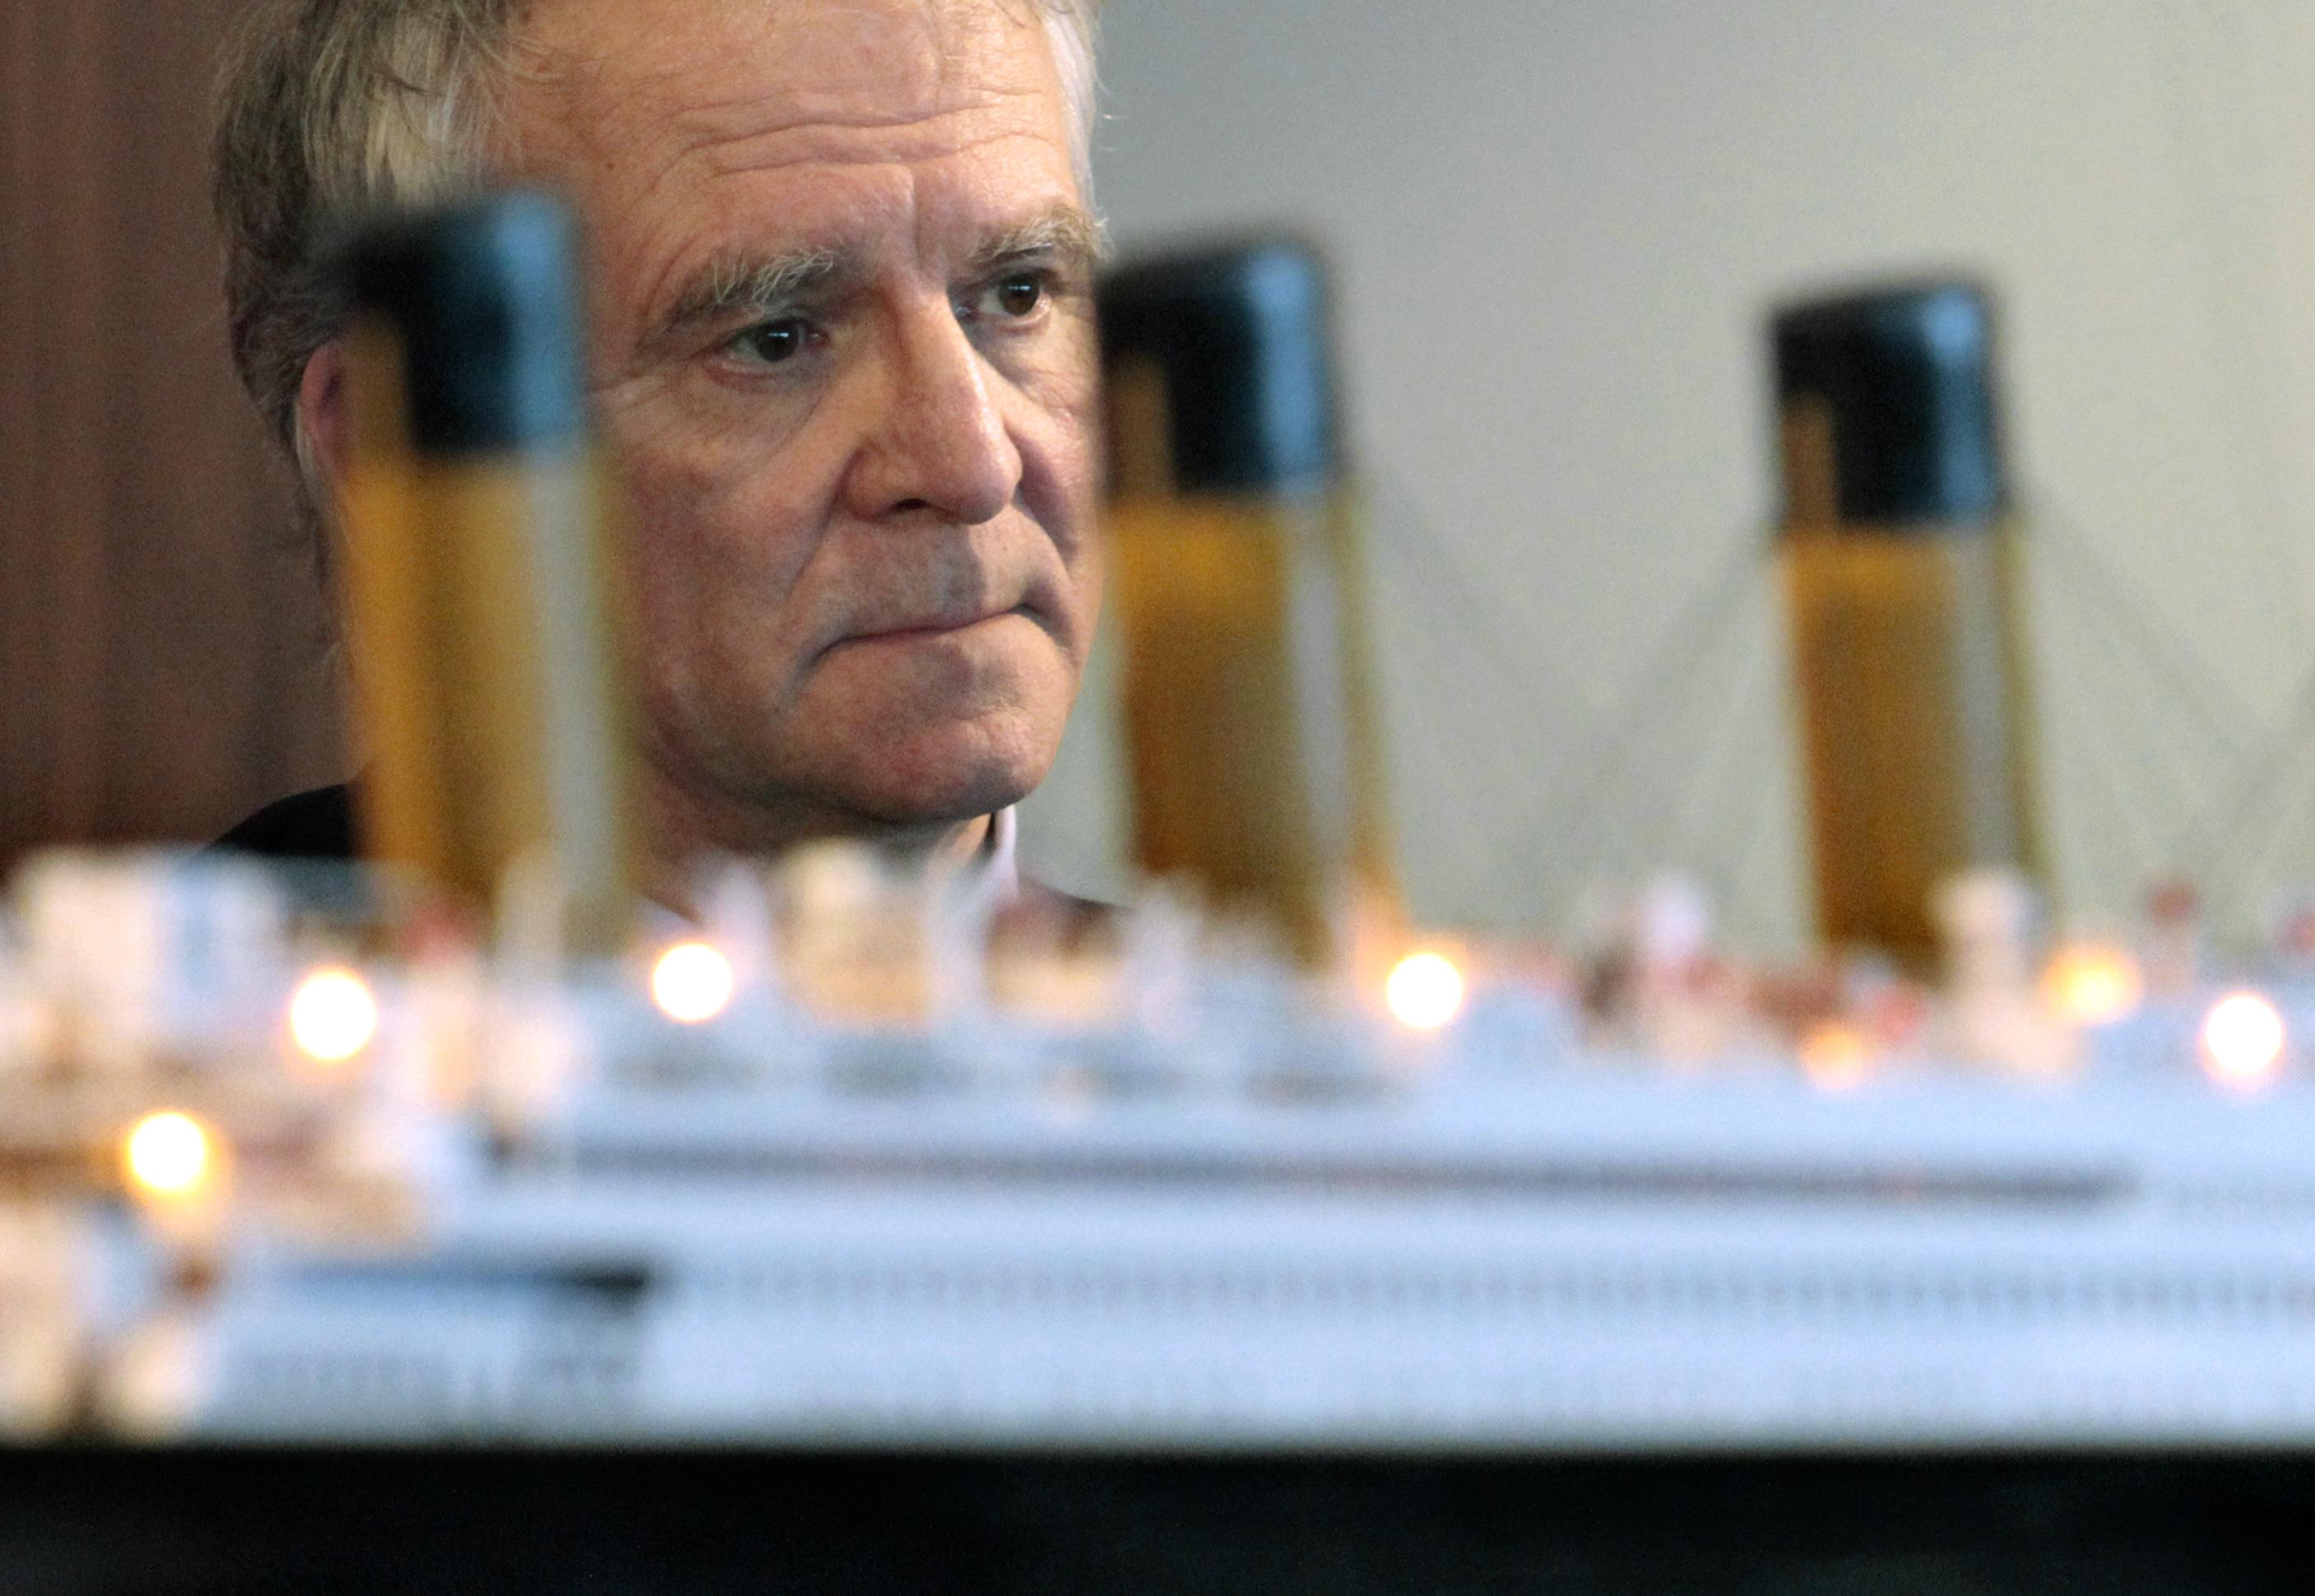 Richmond Va Titanic Auction Interest Rises As 100th Mark Nears Vos Iz Neias